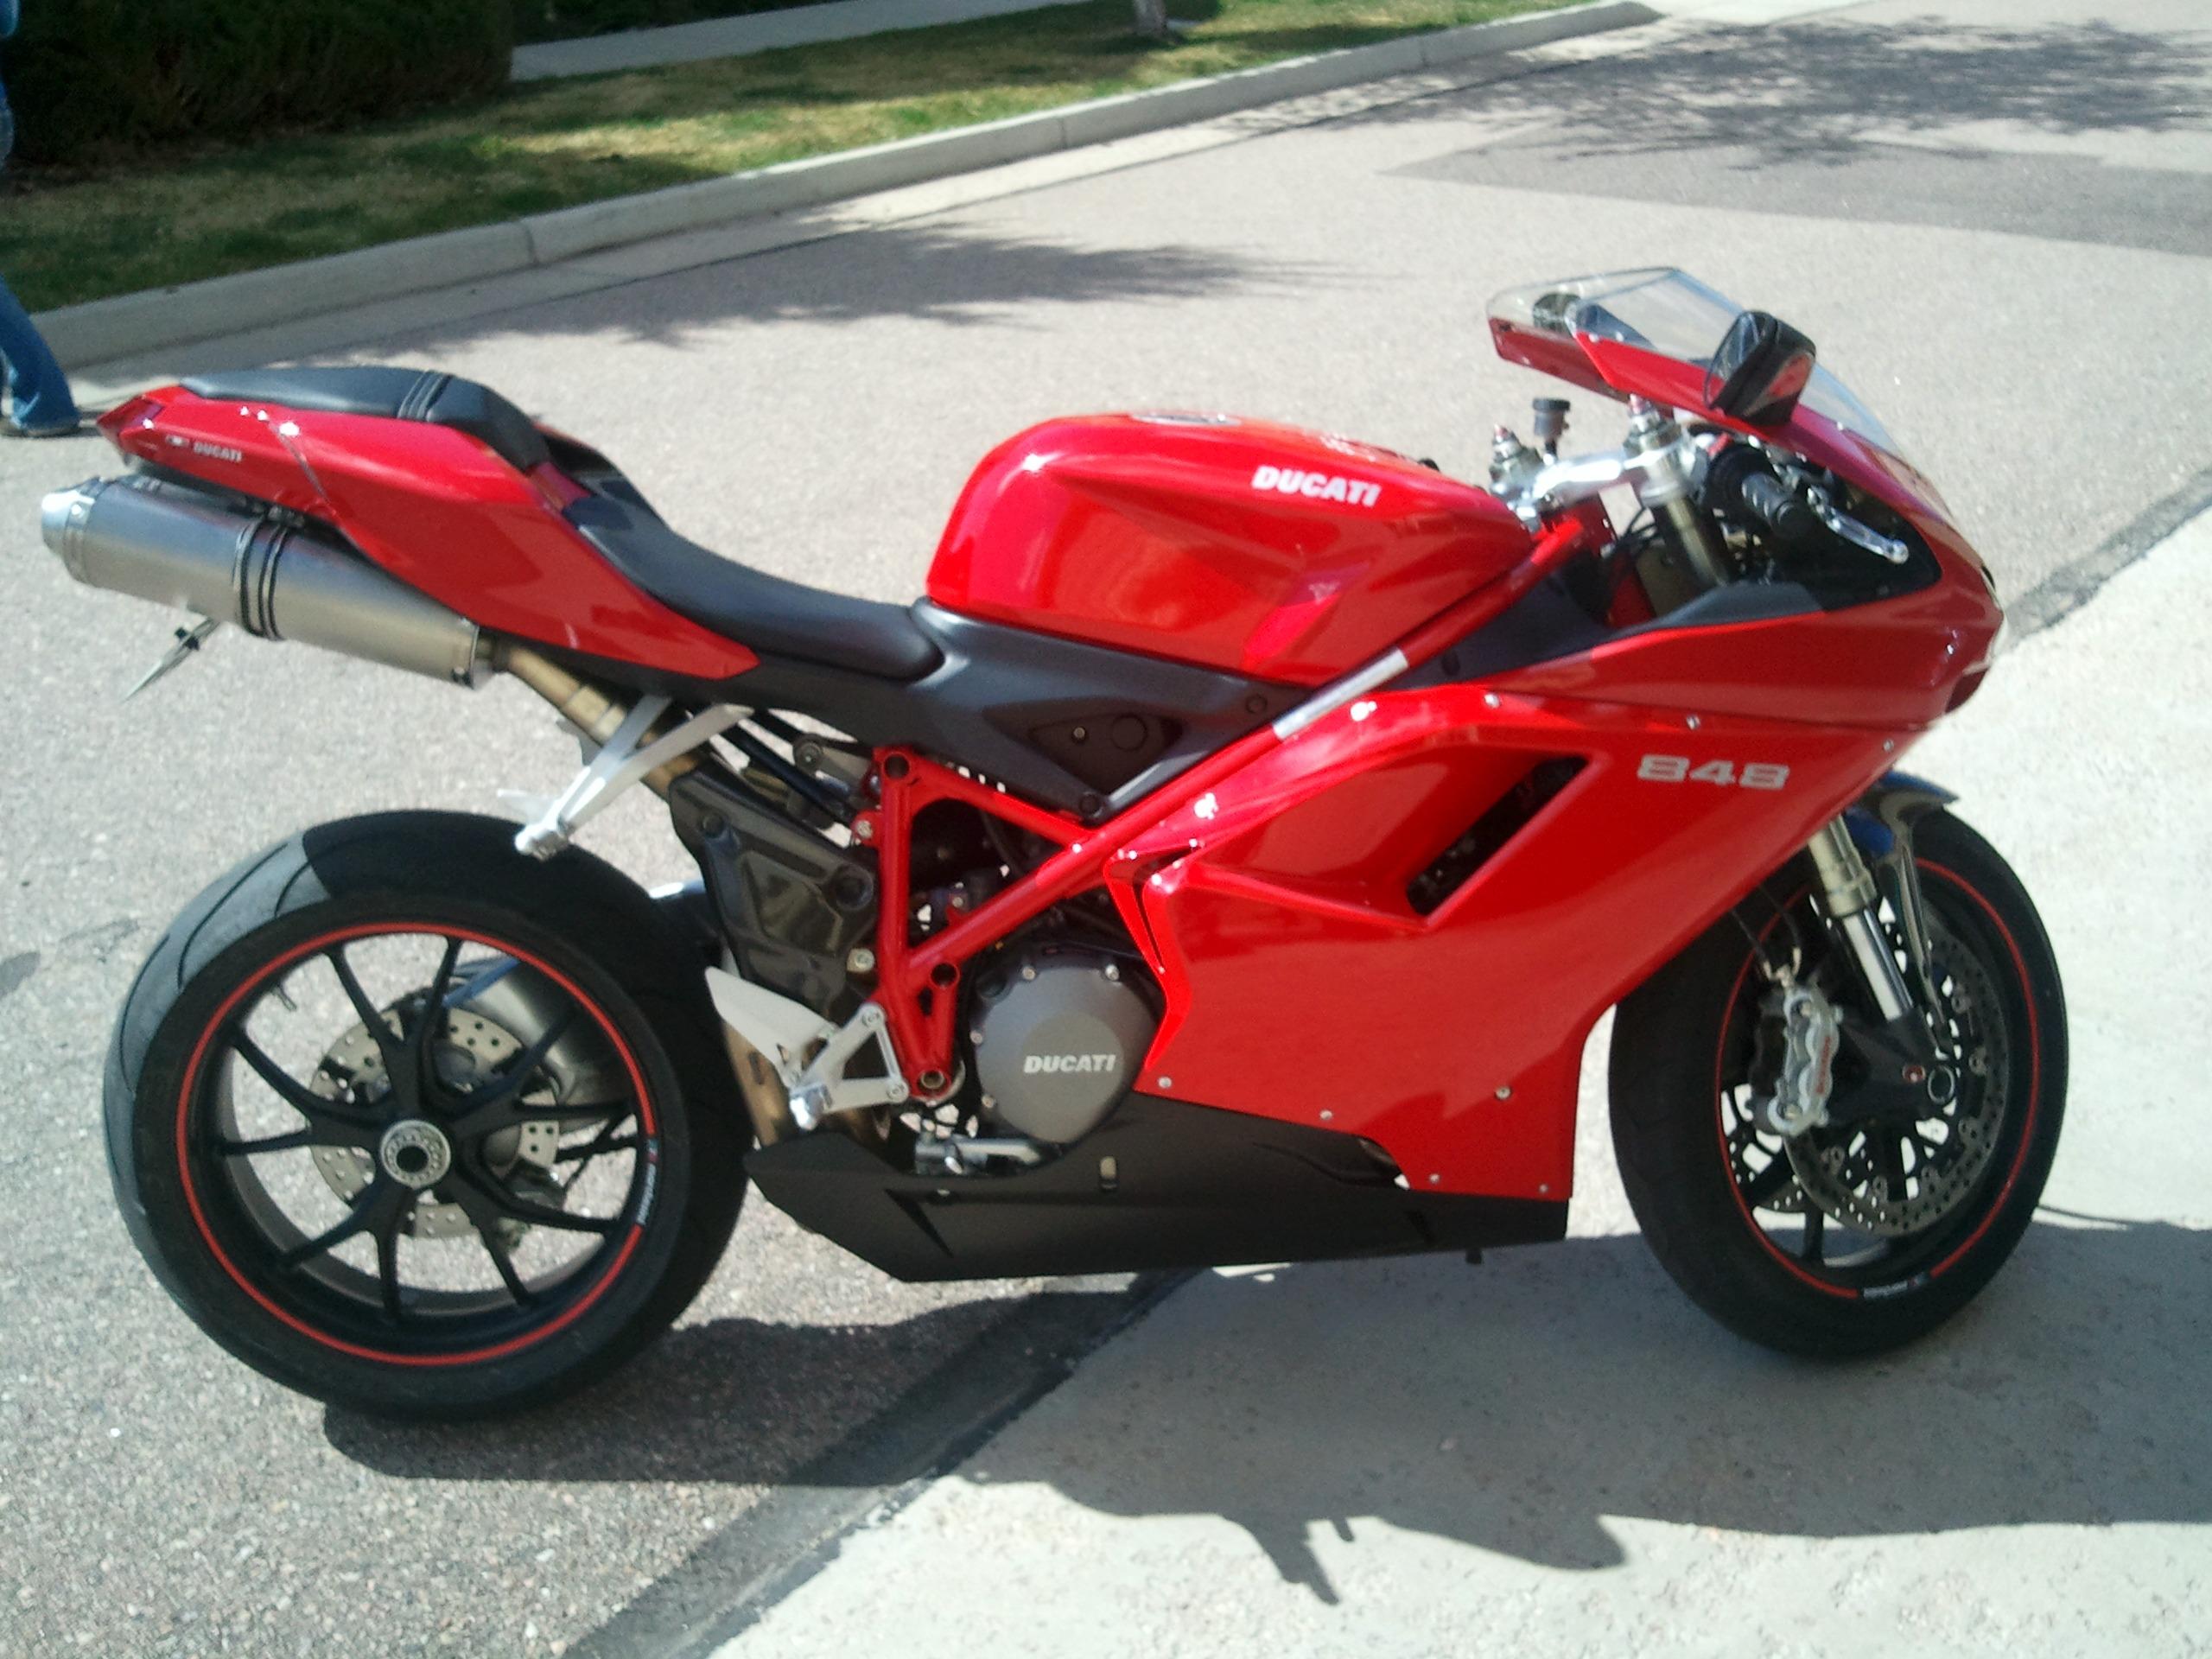 2008 ducati 848 for sale!!!! - ducati forum | the home for